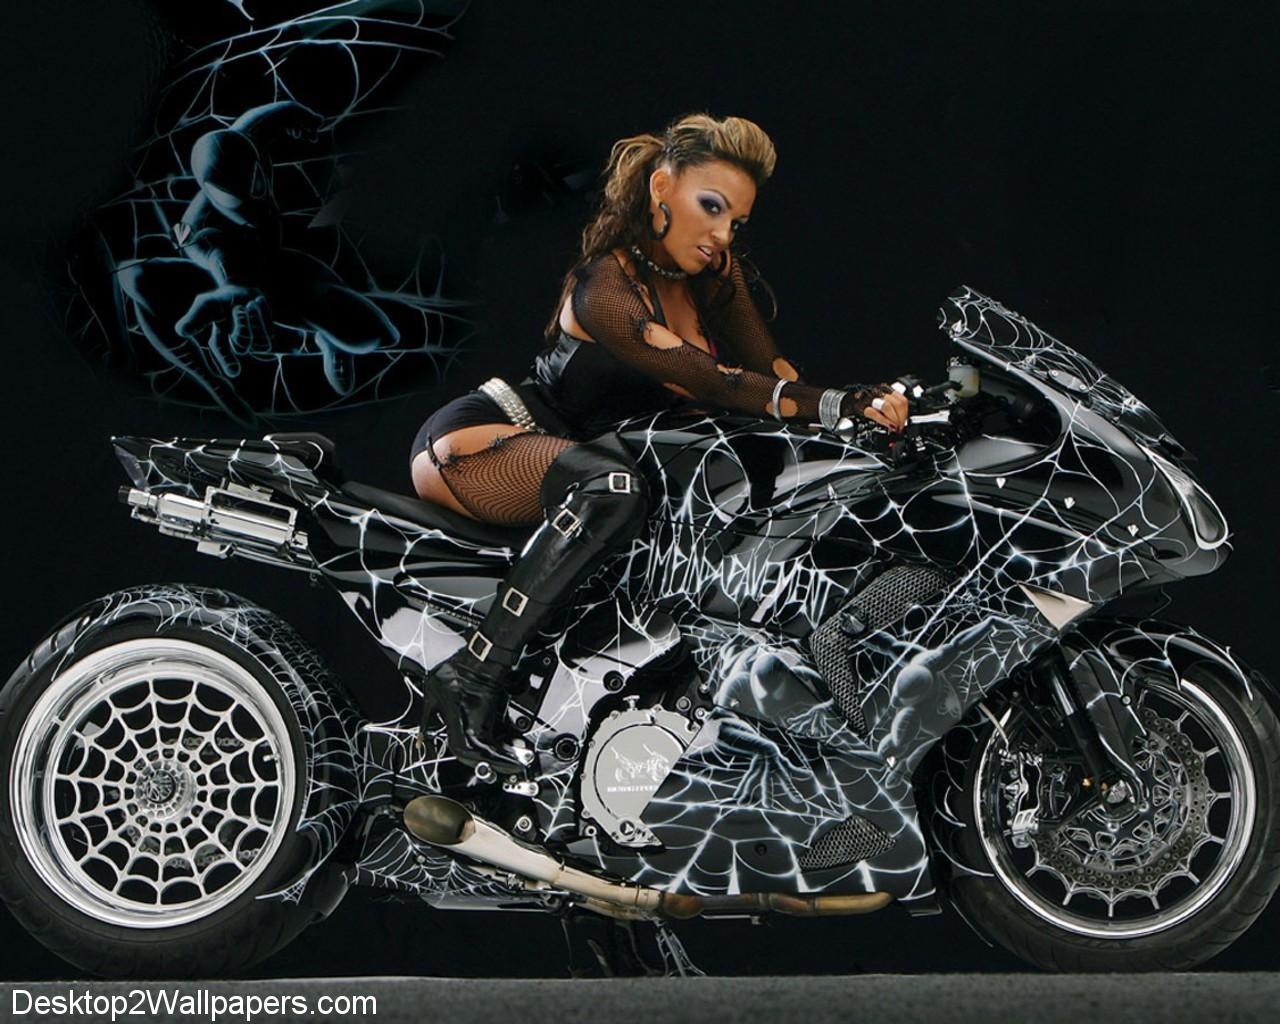 girl car and hot free motorcycles hd 192393 wallpaper wallpaper